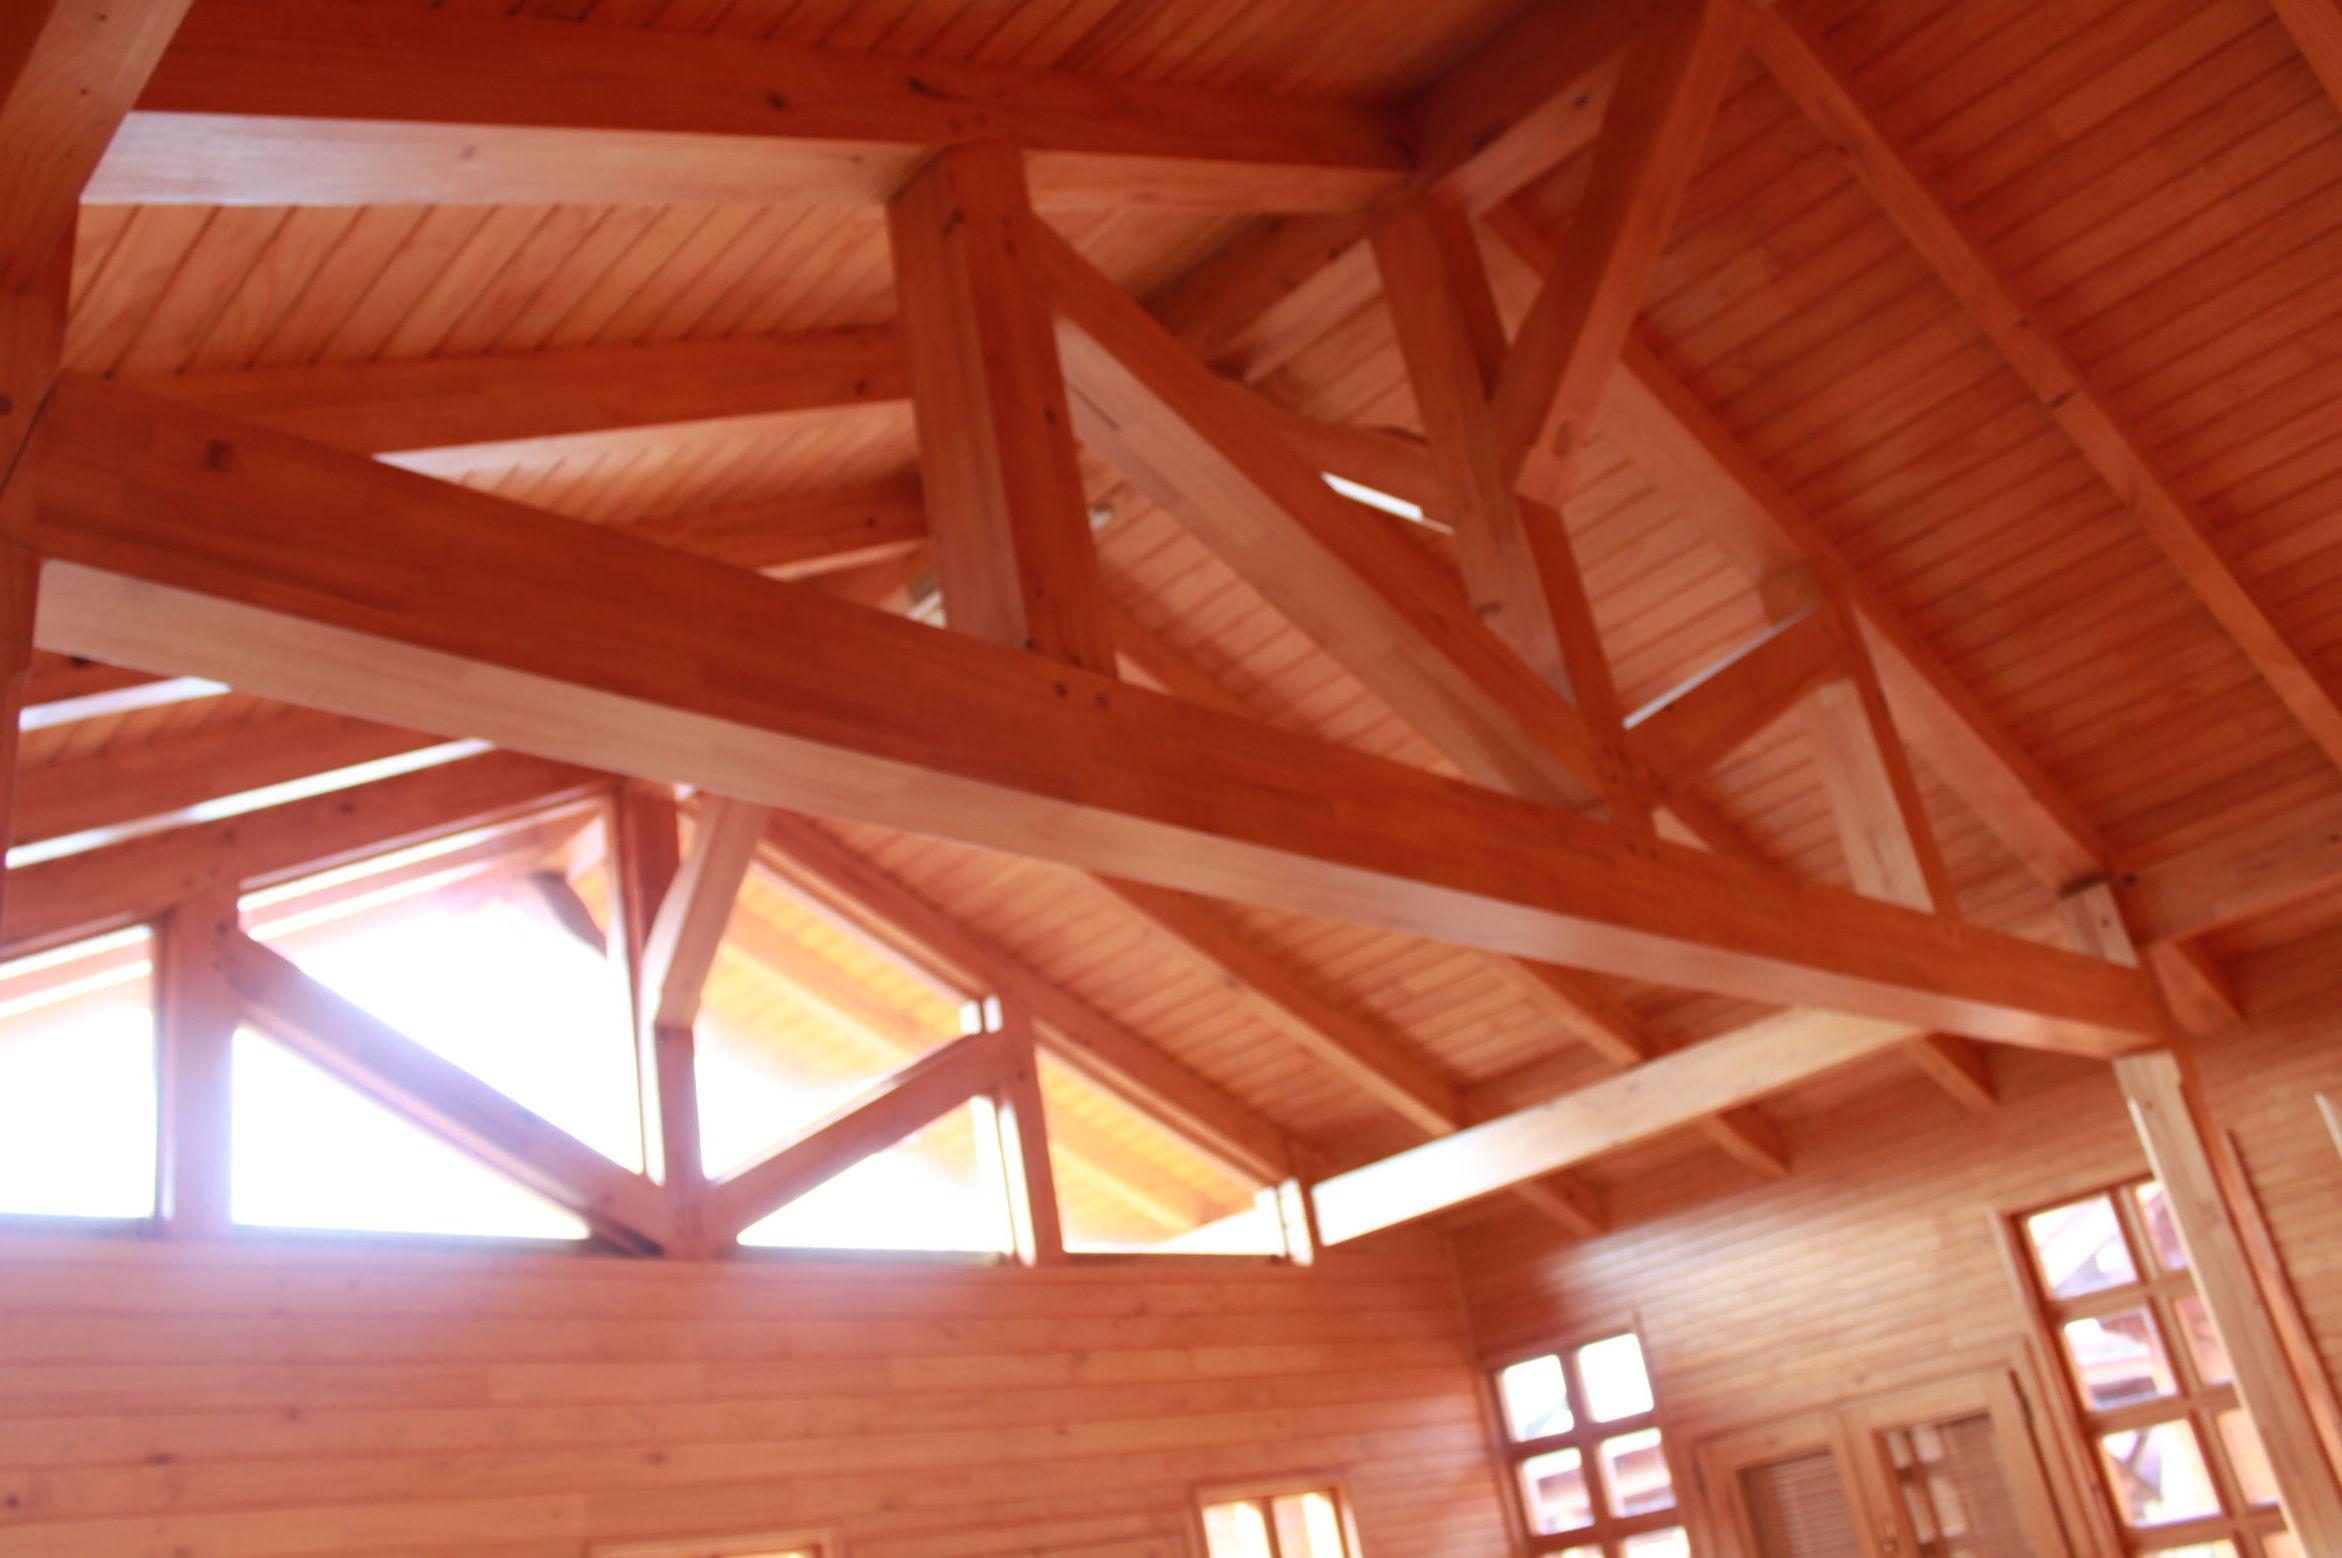 Buhardilla Madera Tenerife  wood loft